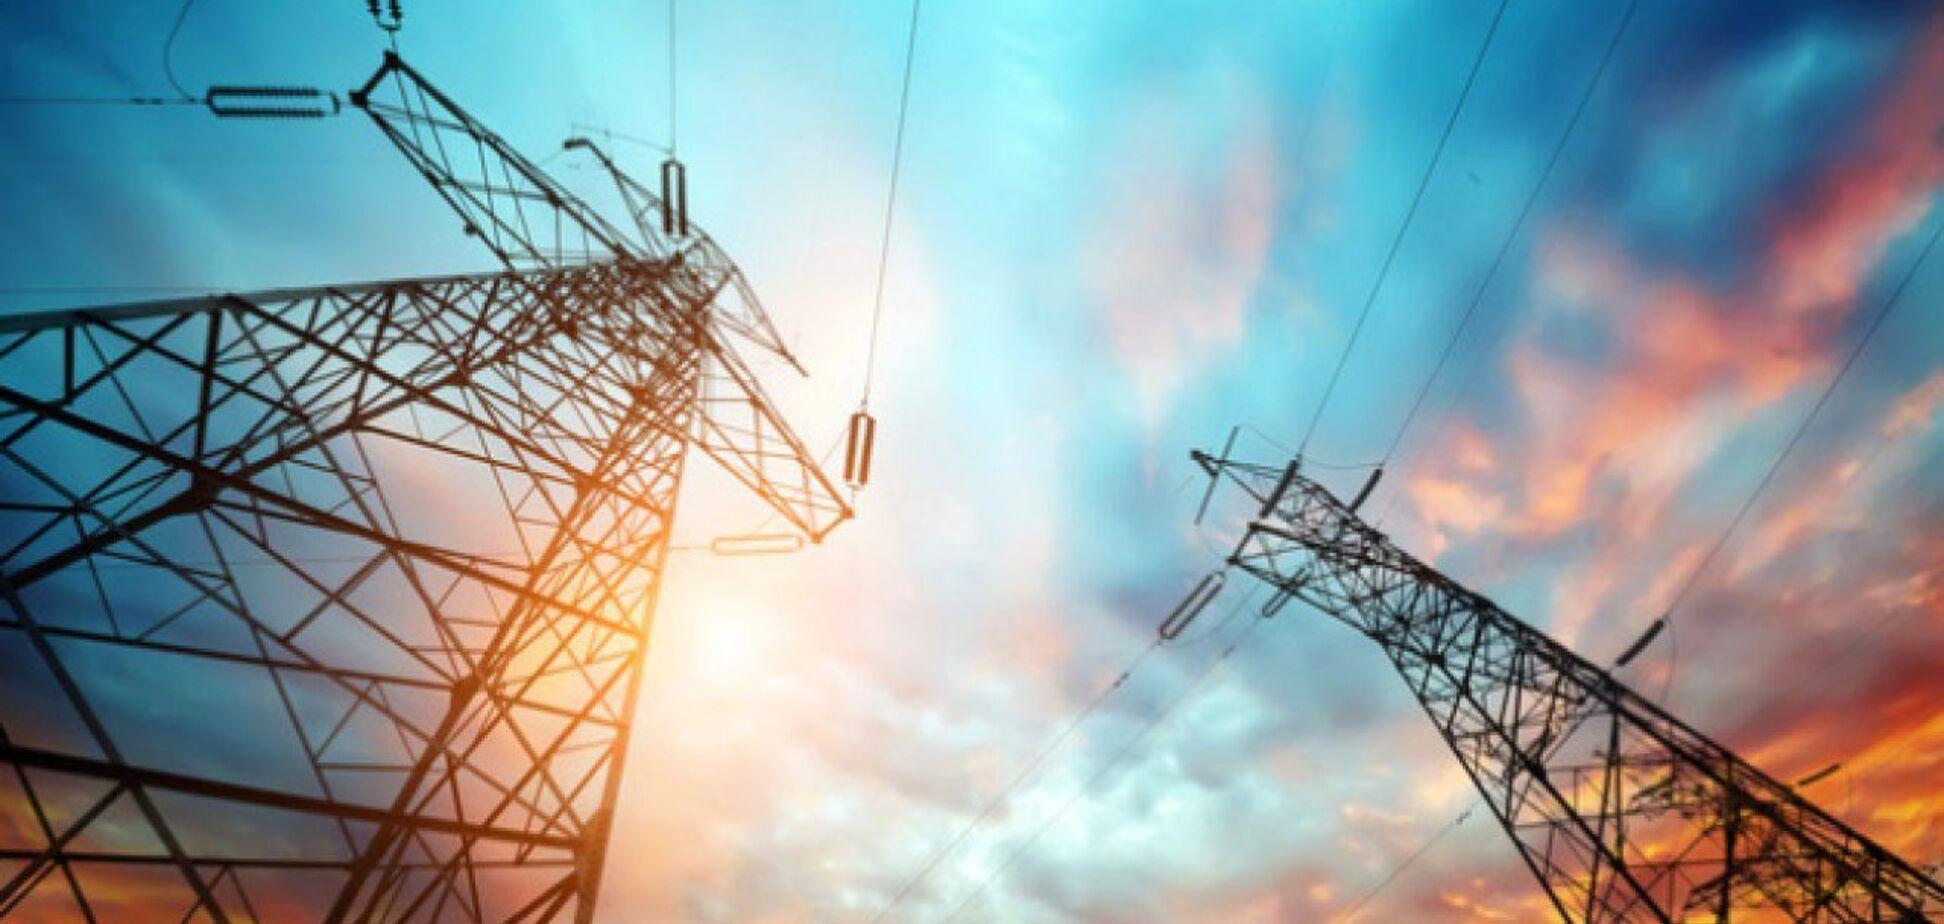 Україна дозволила закуповувати електроенергію країни-агресора